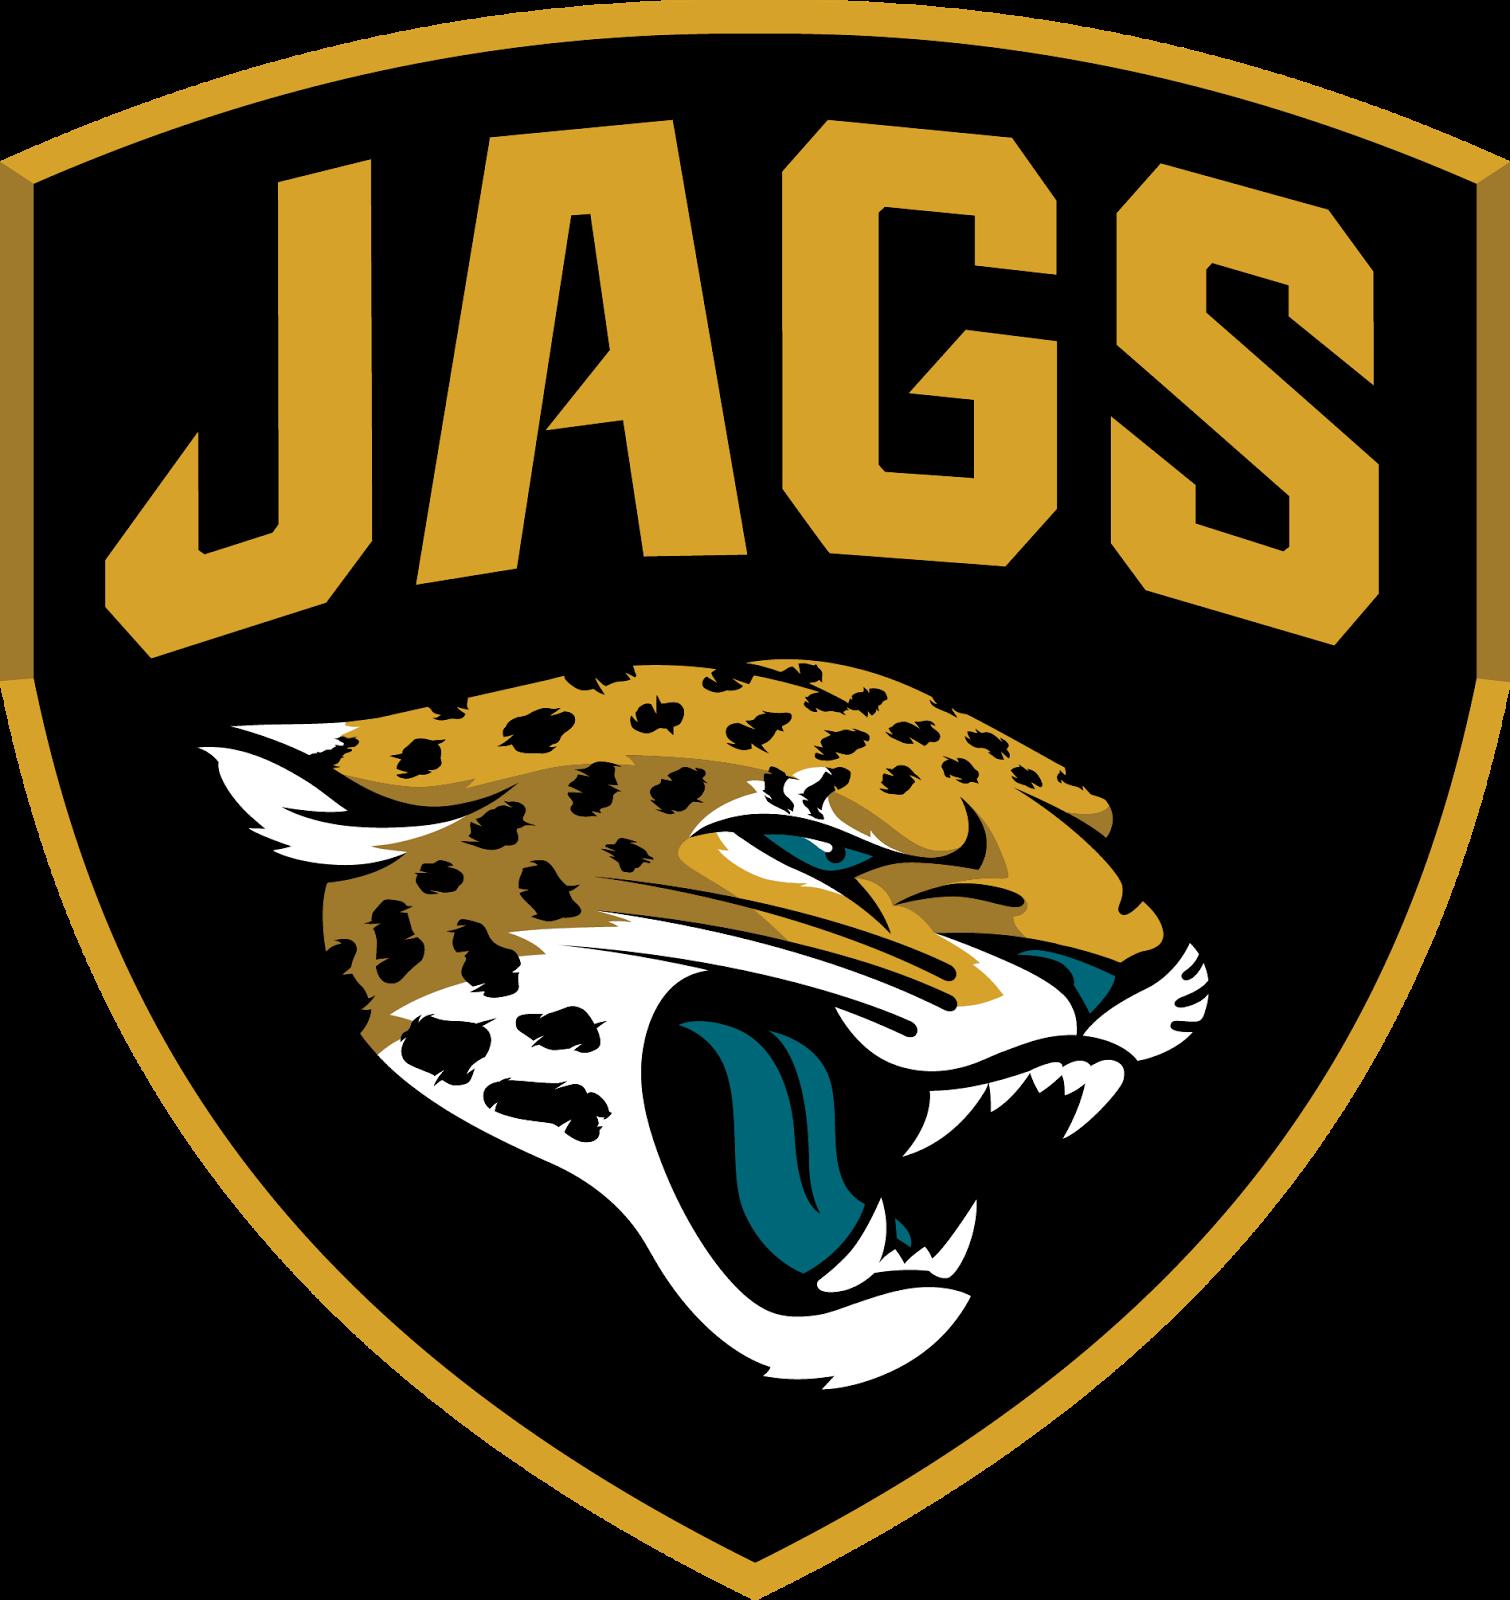 nfl jaguars jacksonville logo novo football logos team jaguar teams novos alternativos um